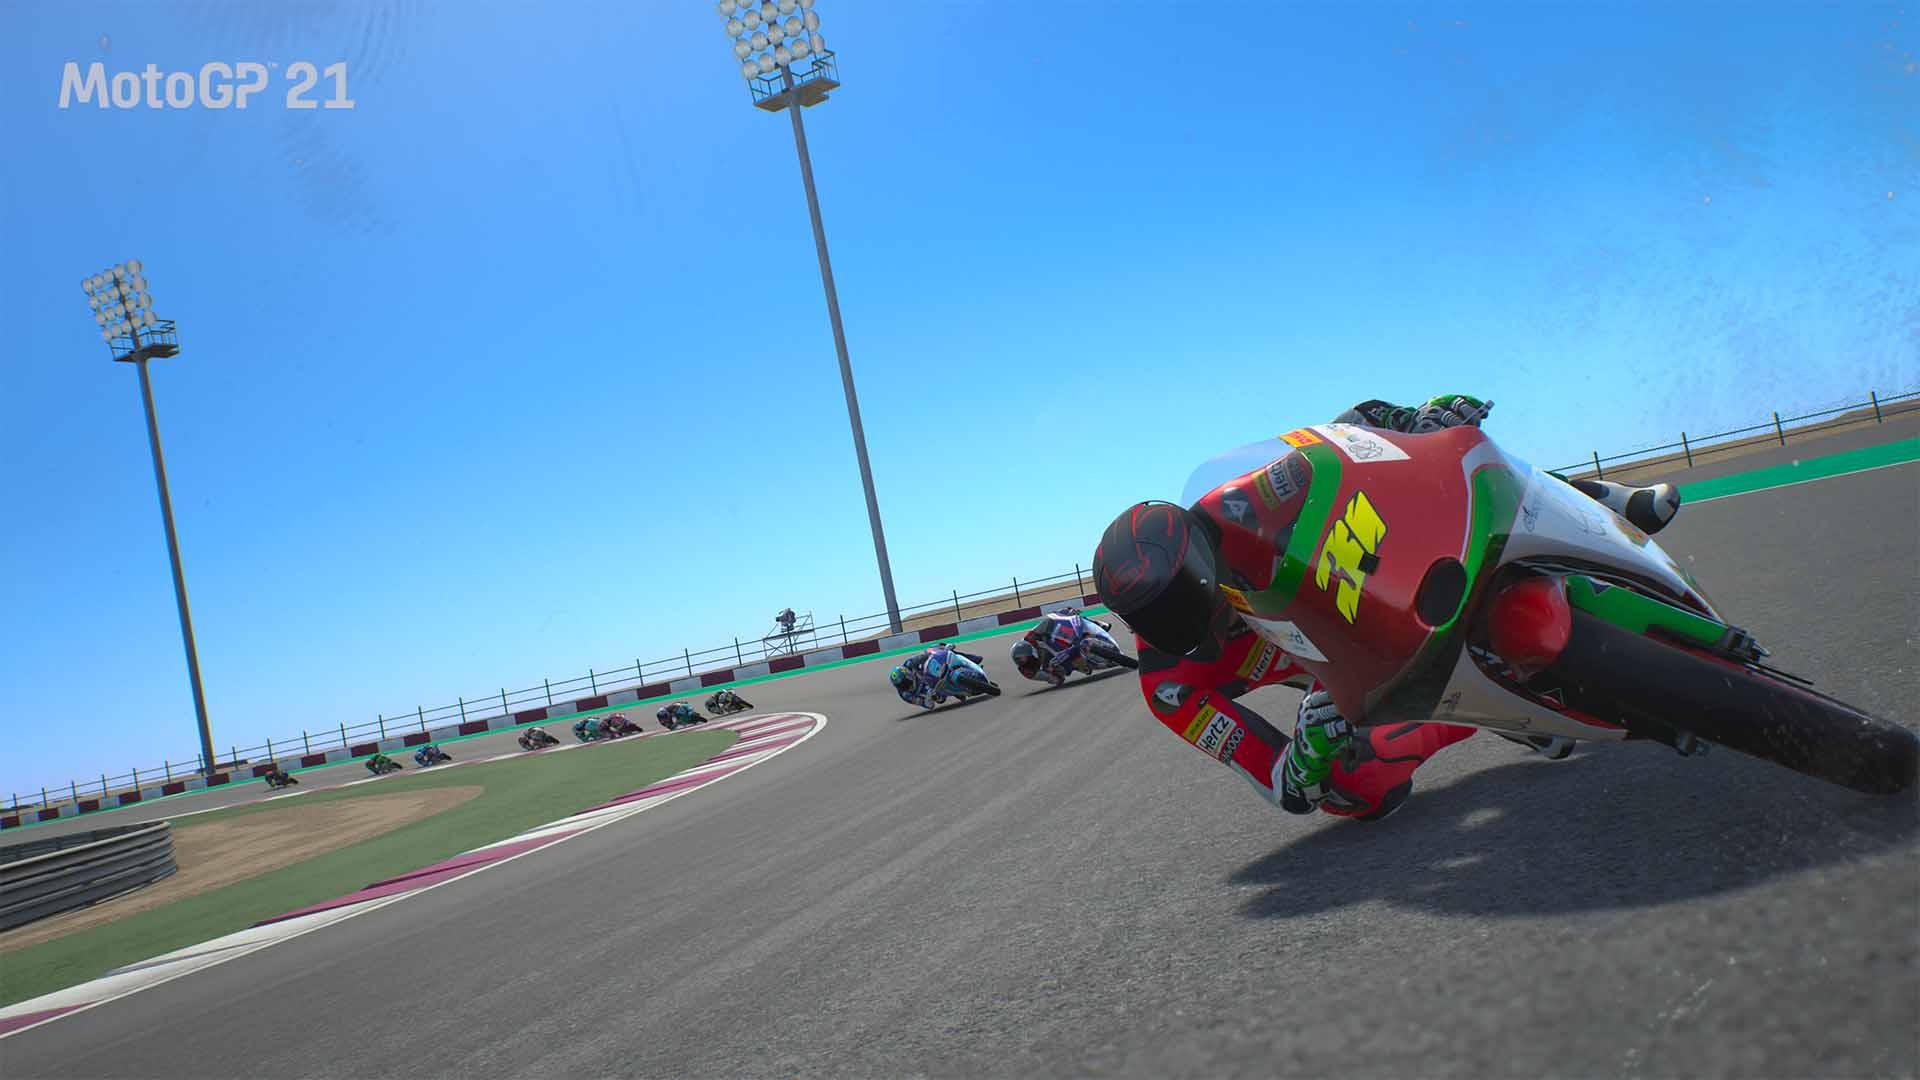 Análisis de MotoGP 21 - Xbox Series X 6